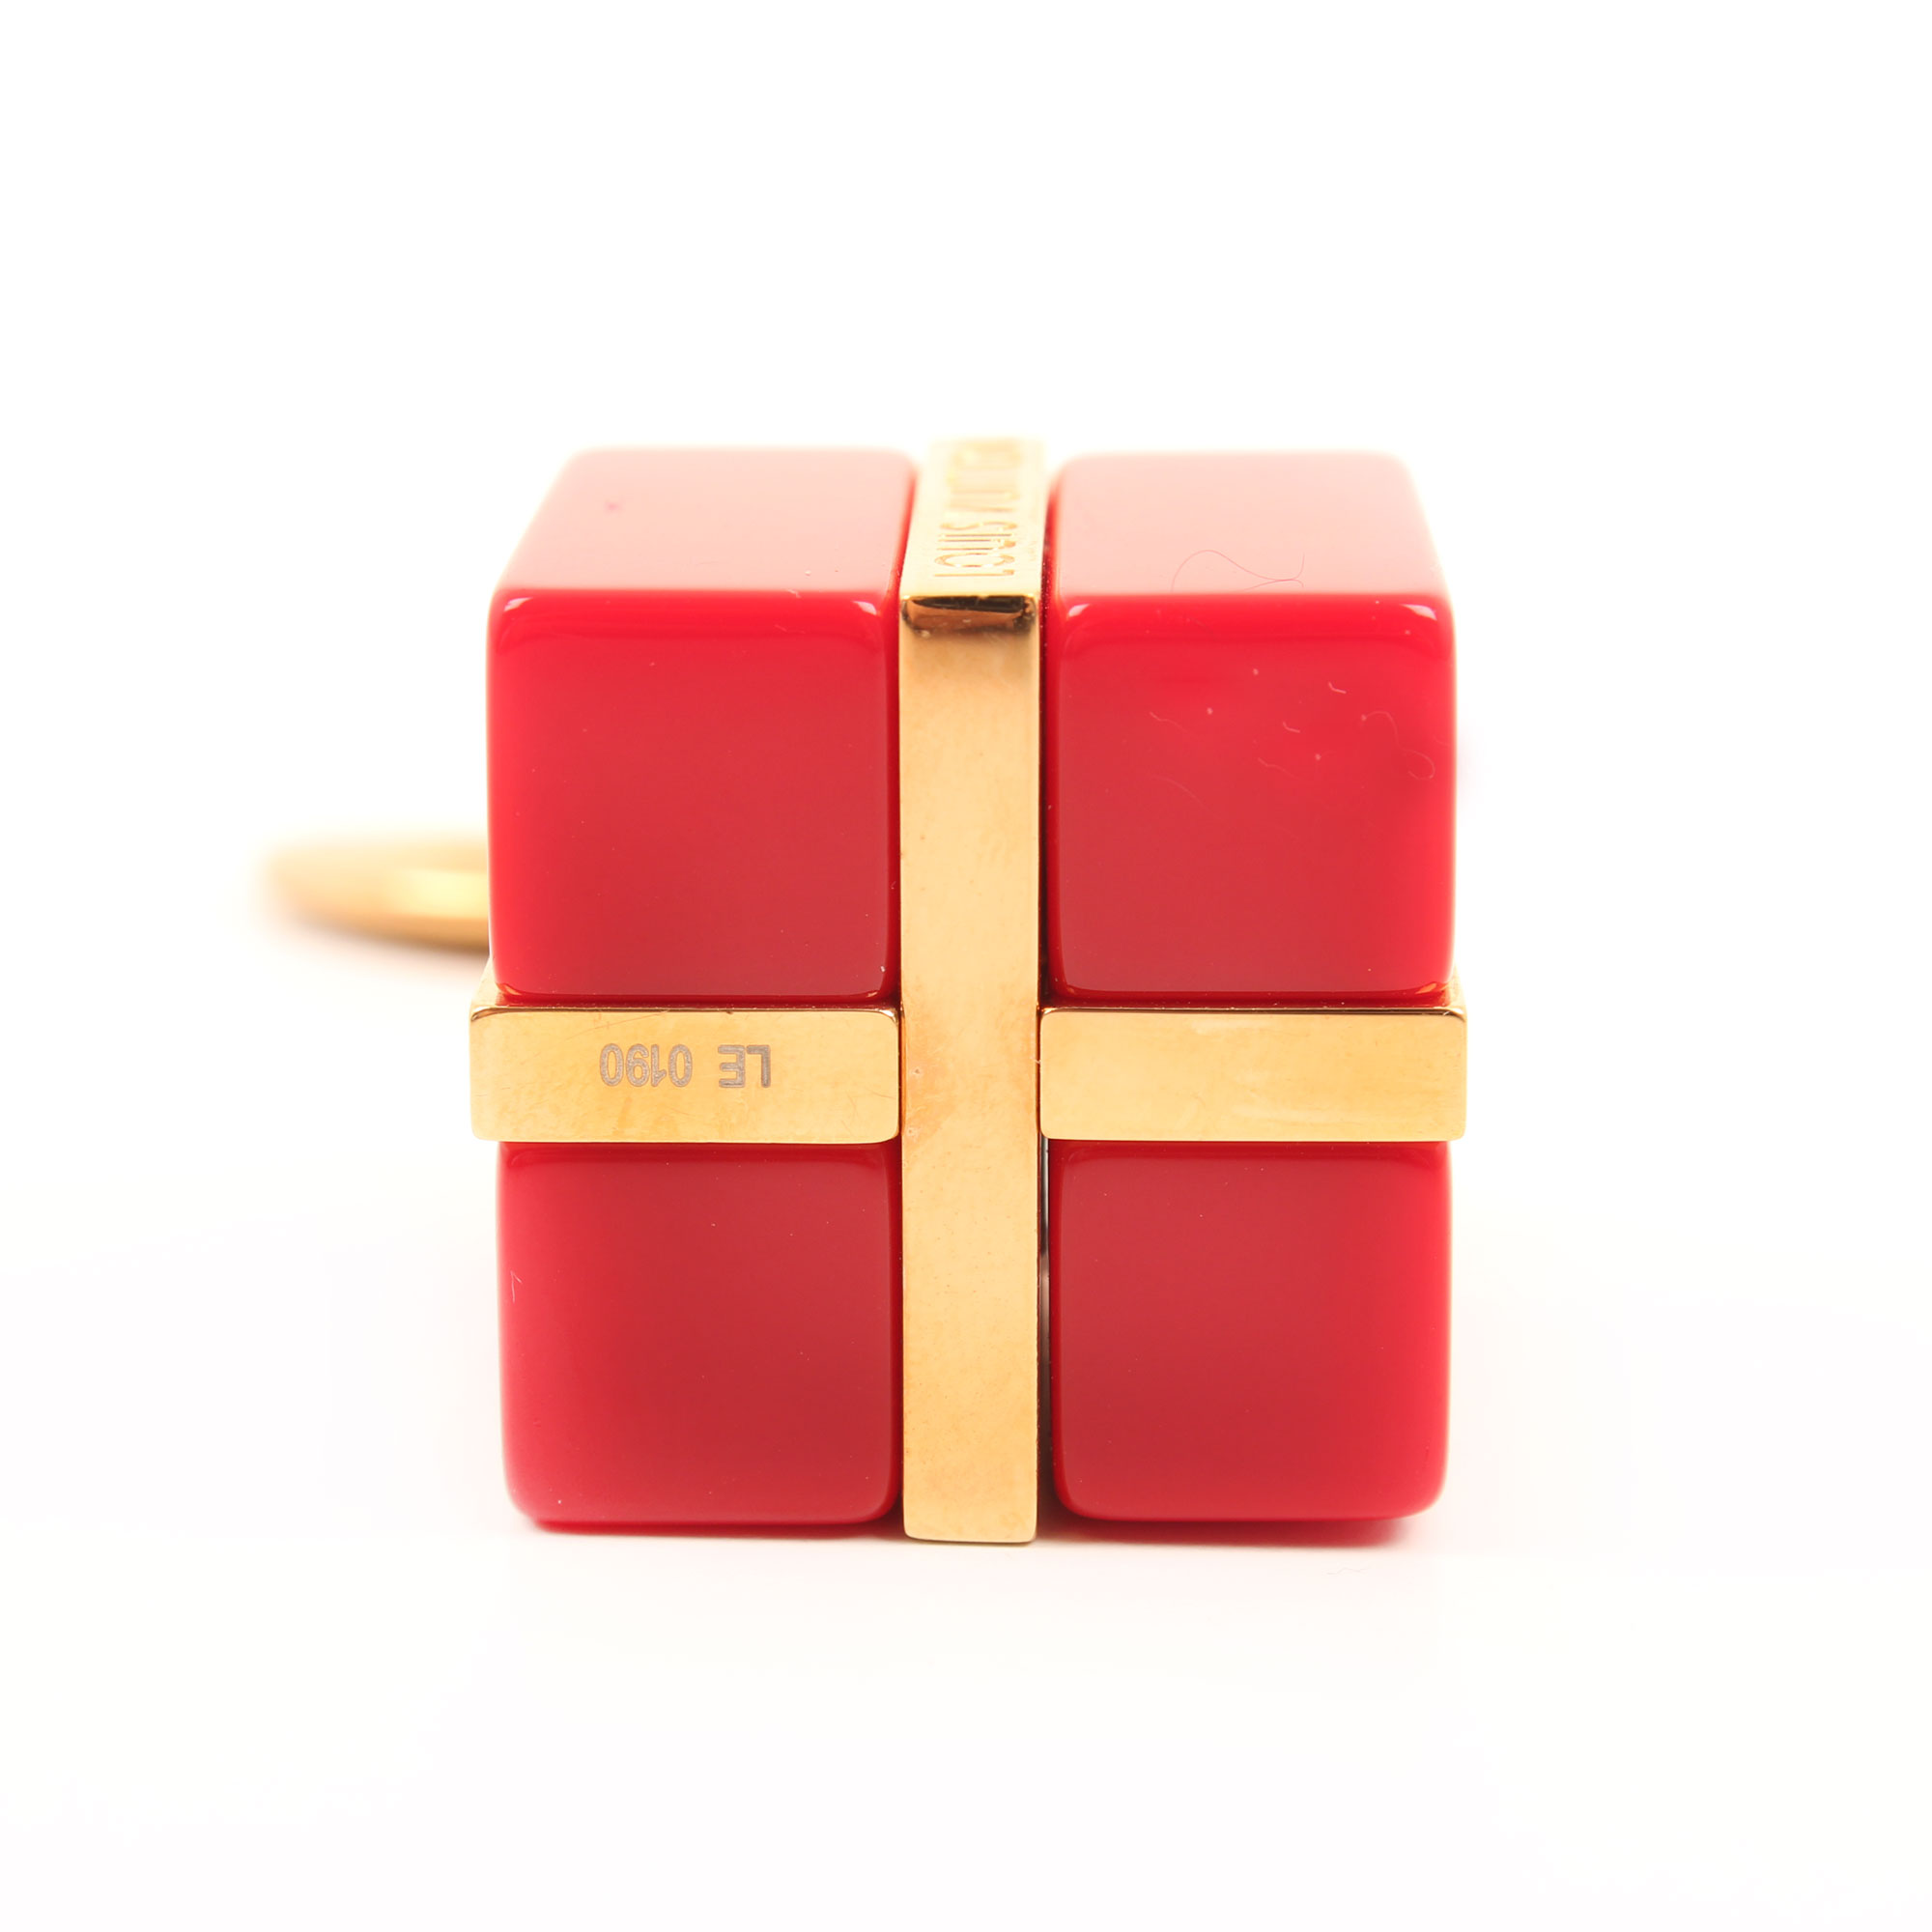 louis vuitton charm gift box bag golden red bottom